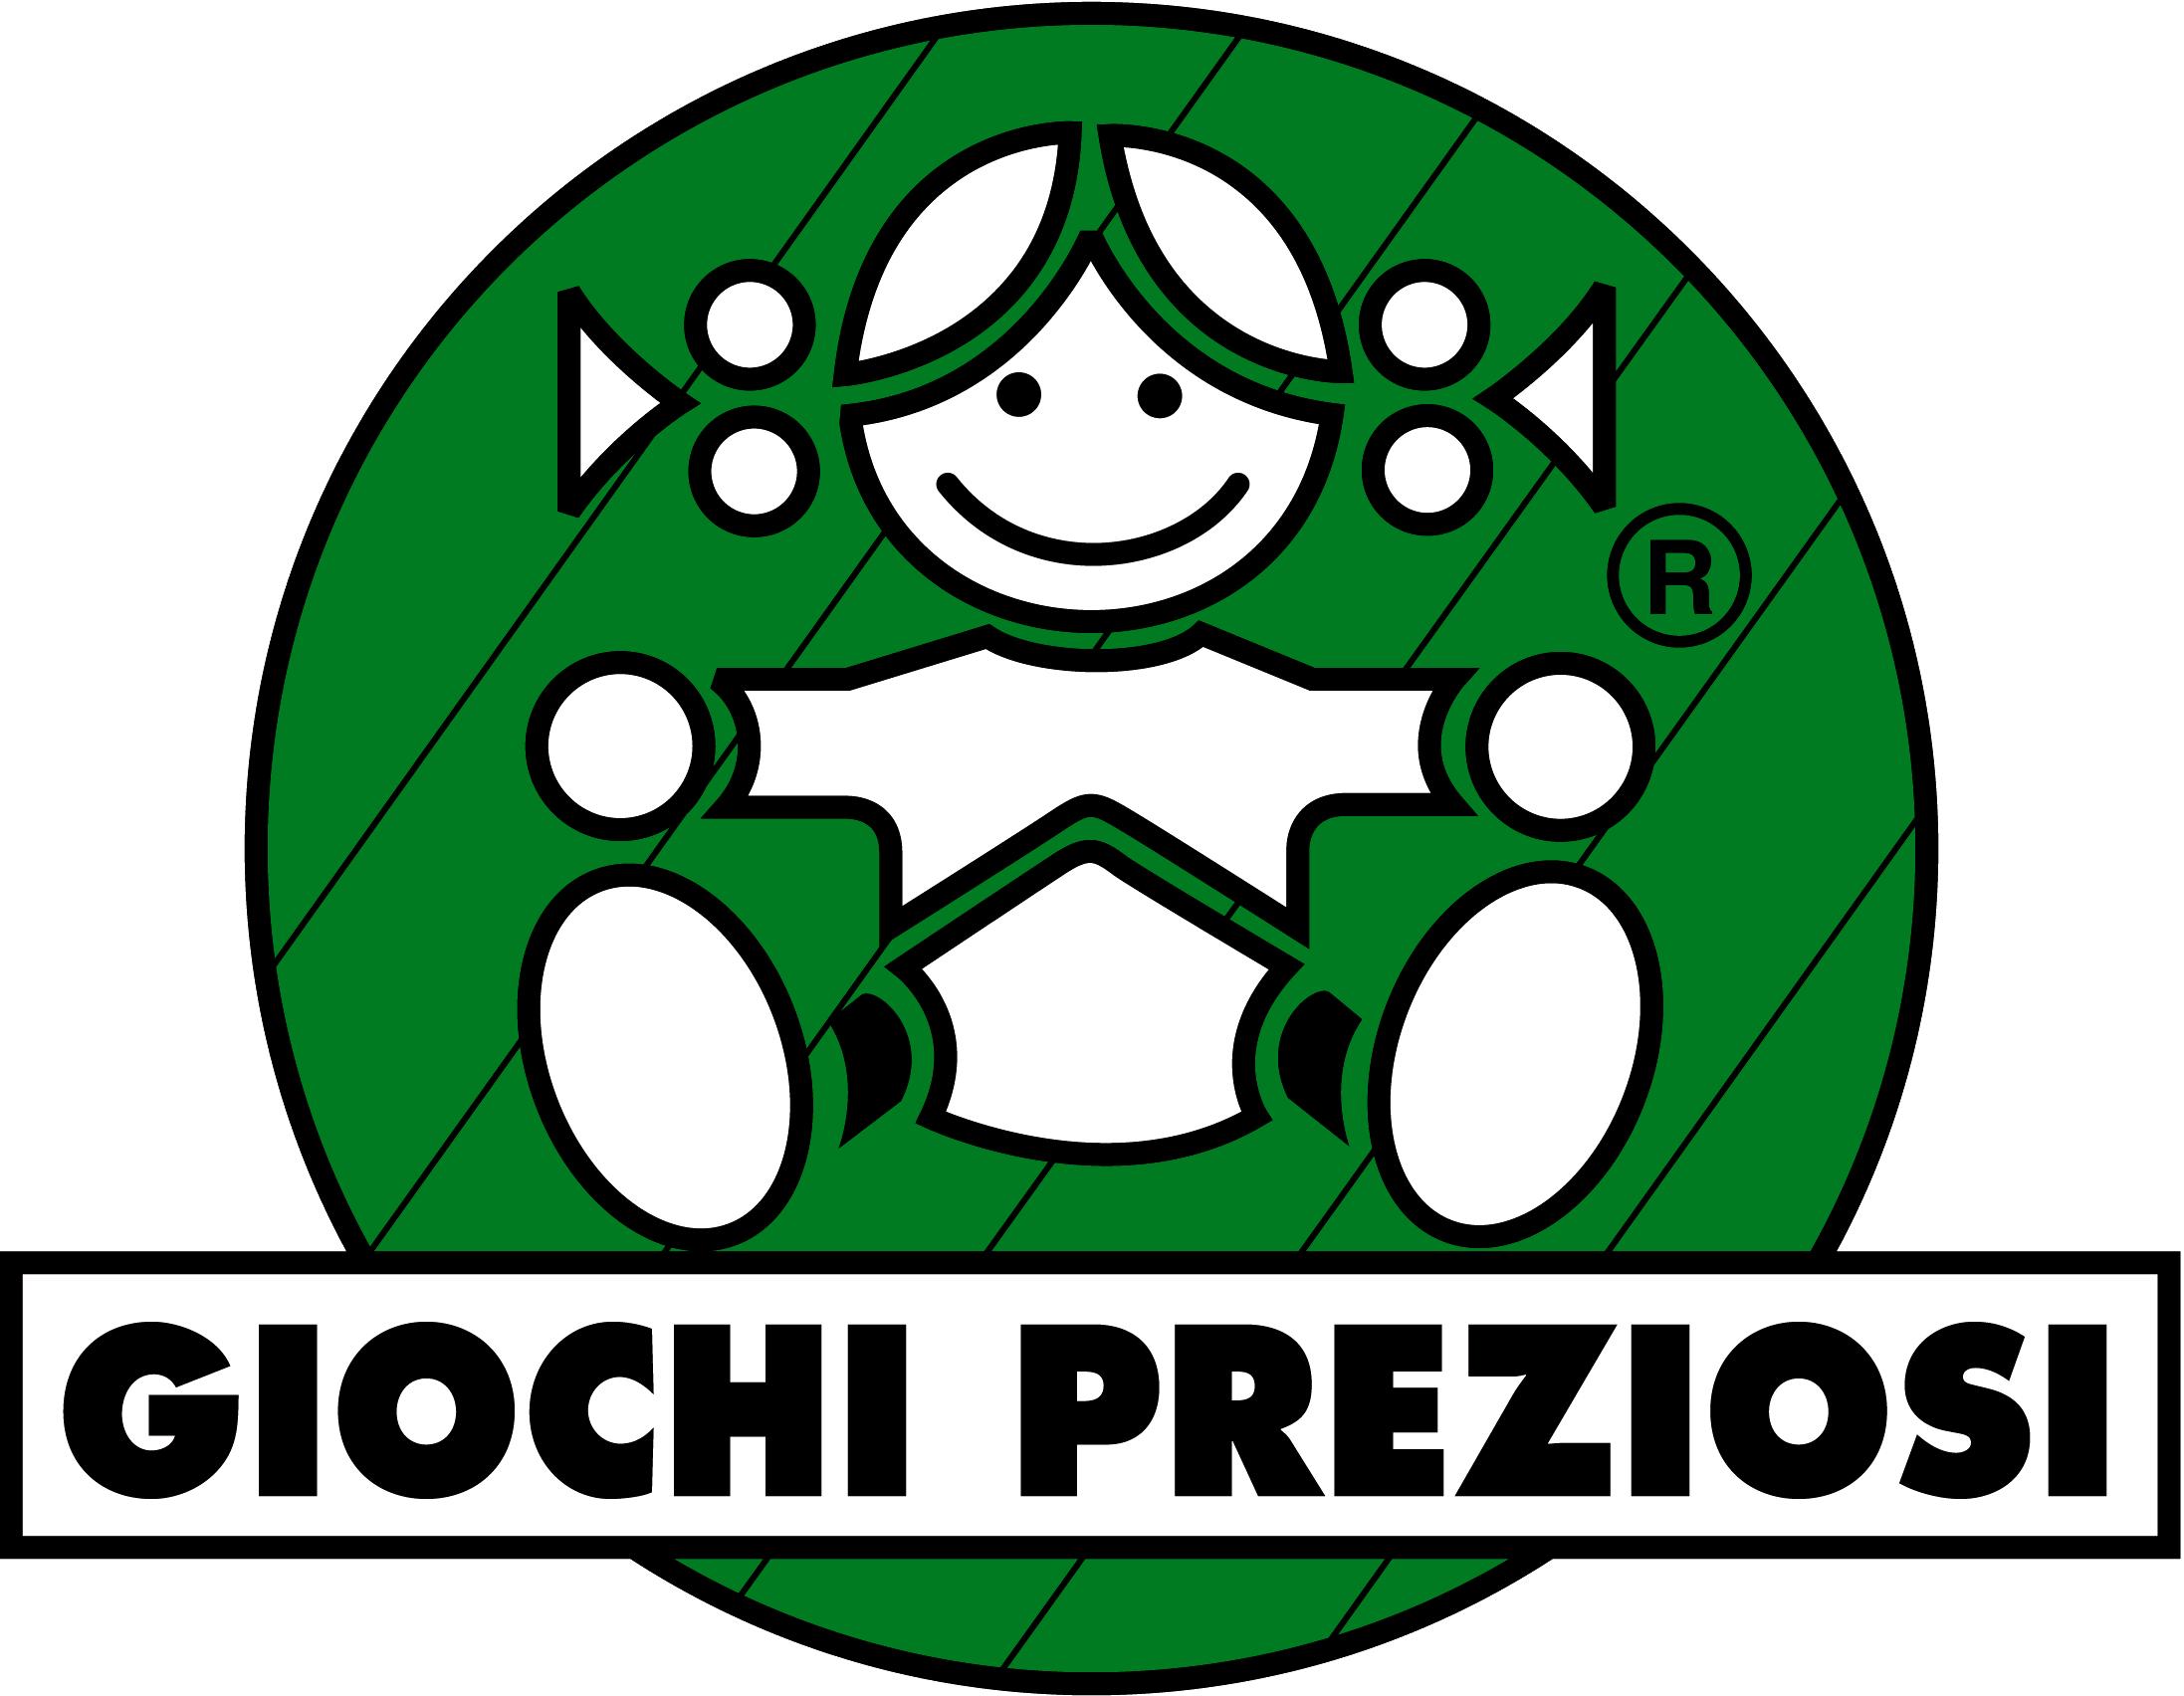 Giochi_Preziosi_logo_2016